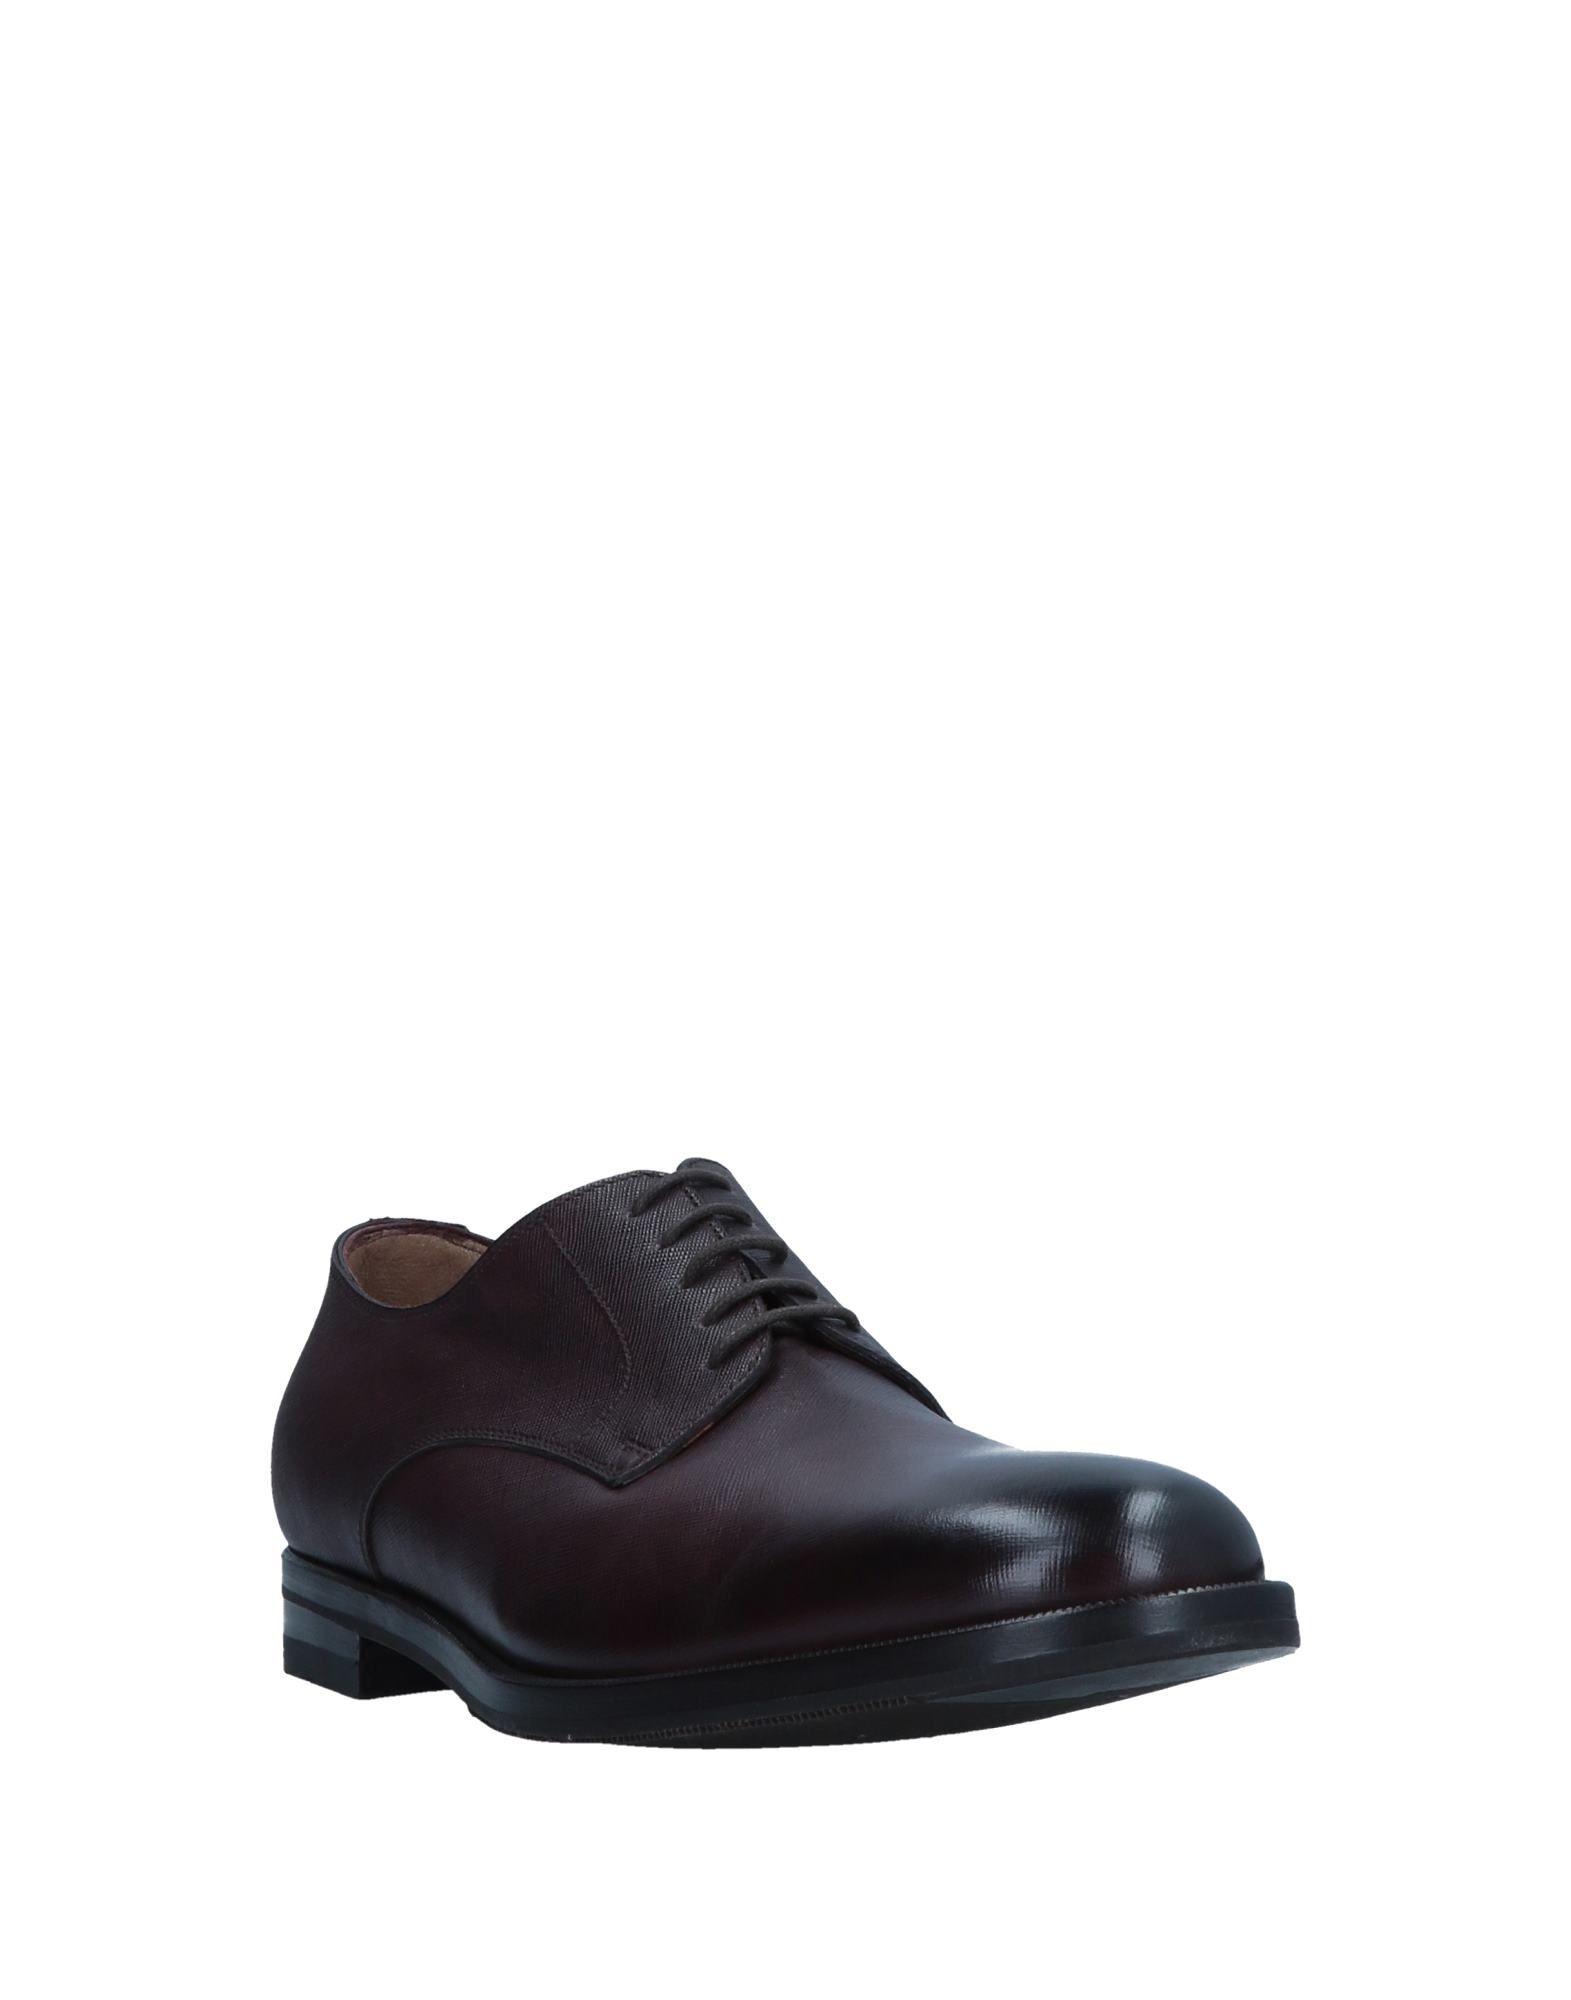 Fratelli Rossetti Schnürschuhe Herren  11557865LB Gute Qualität beliebte beliebte Qualität Schuhe 18634a